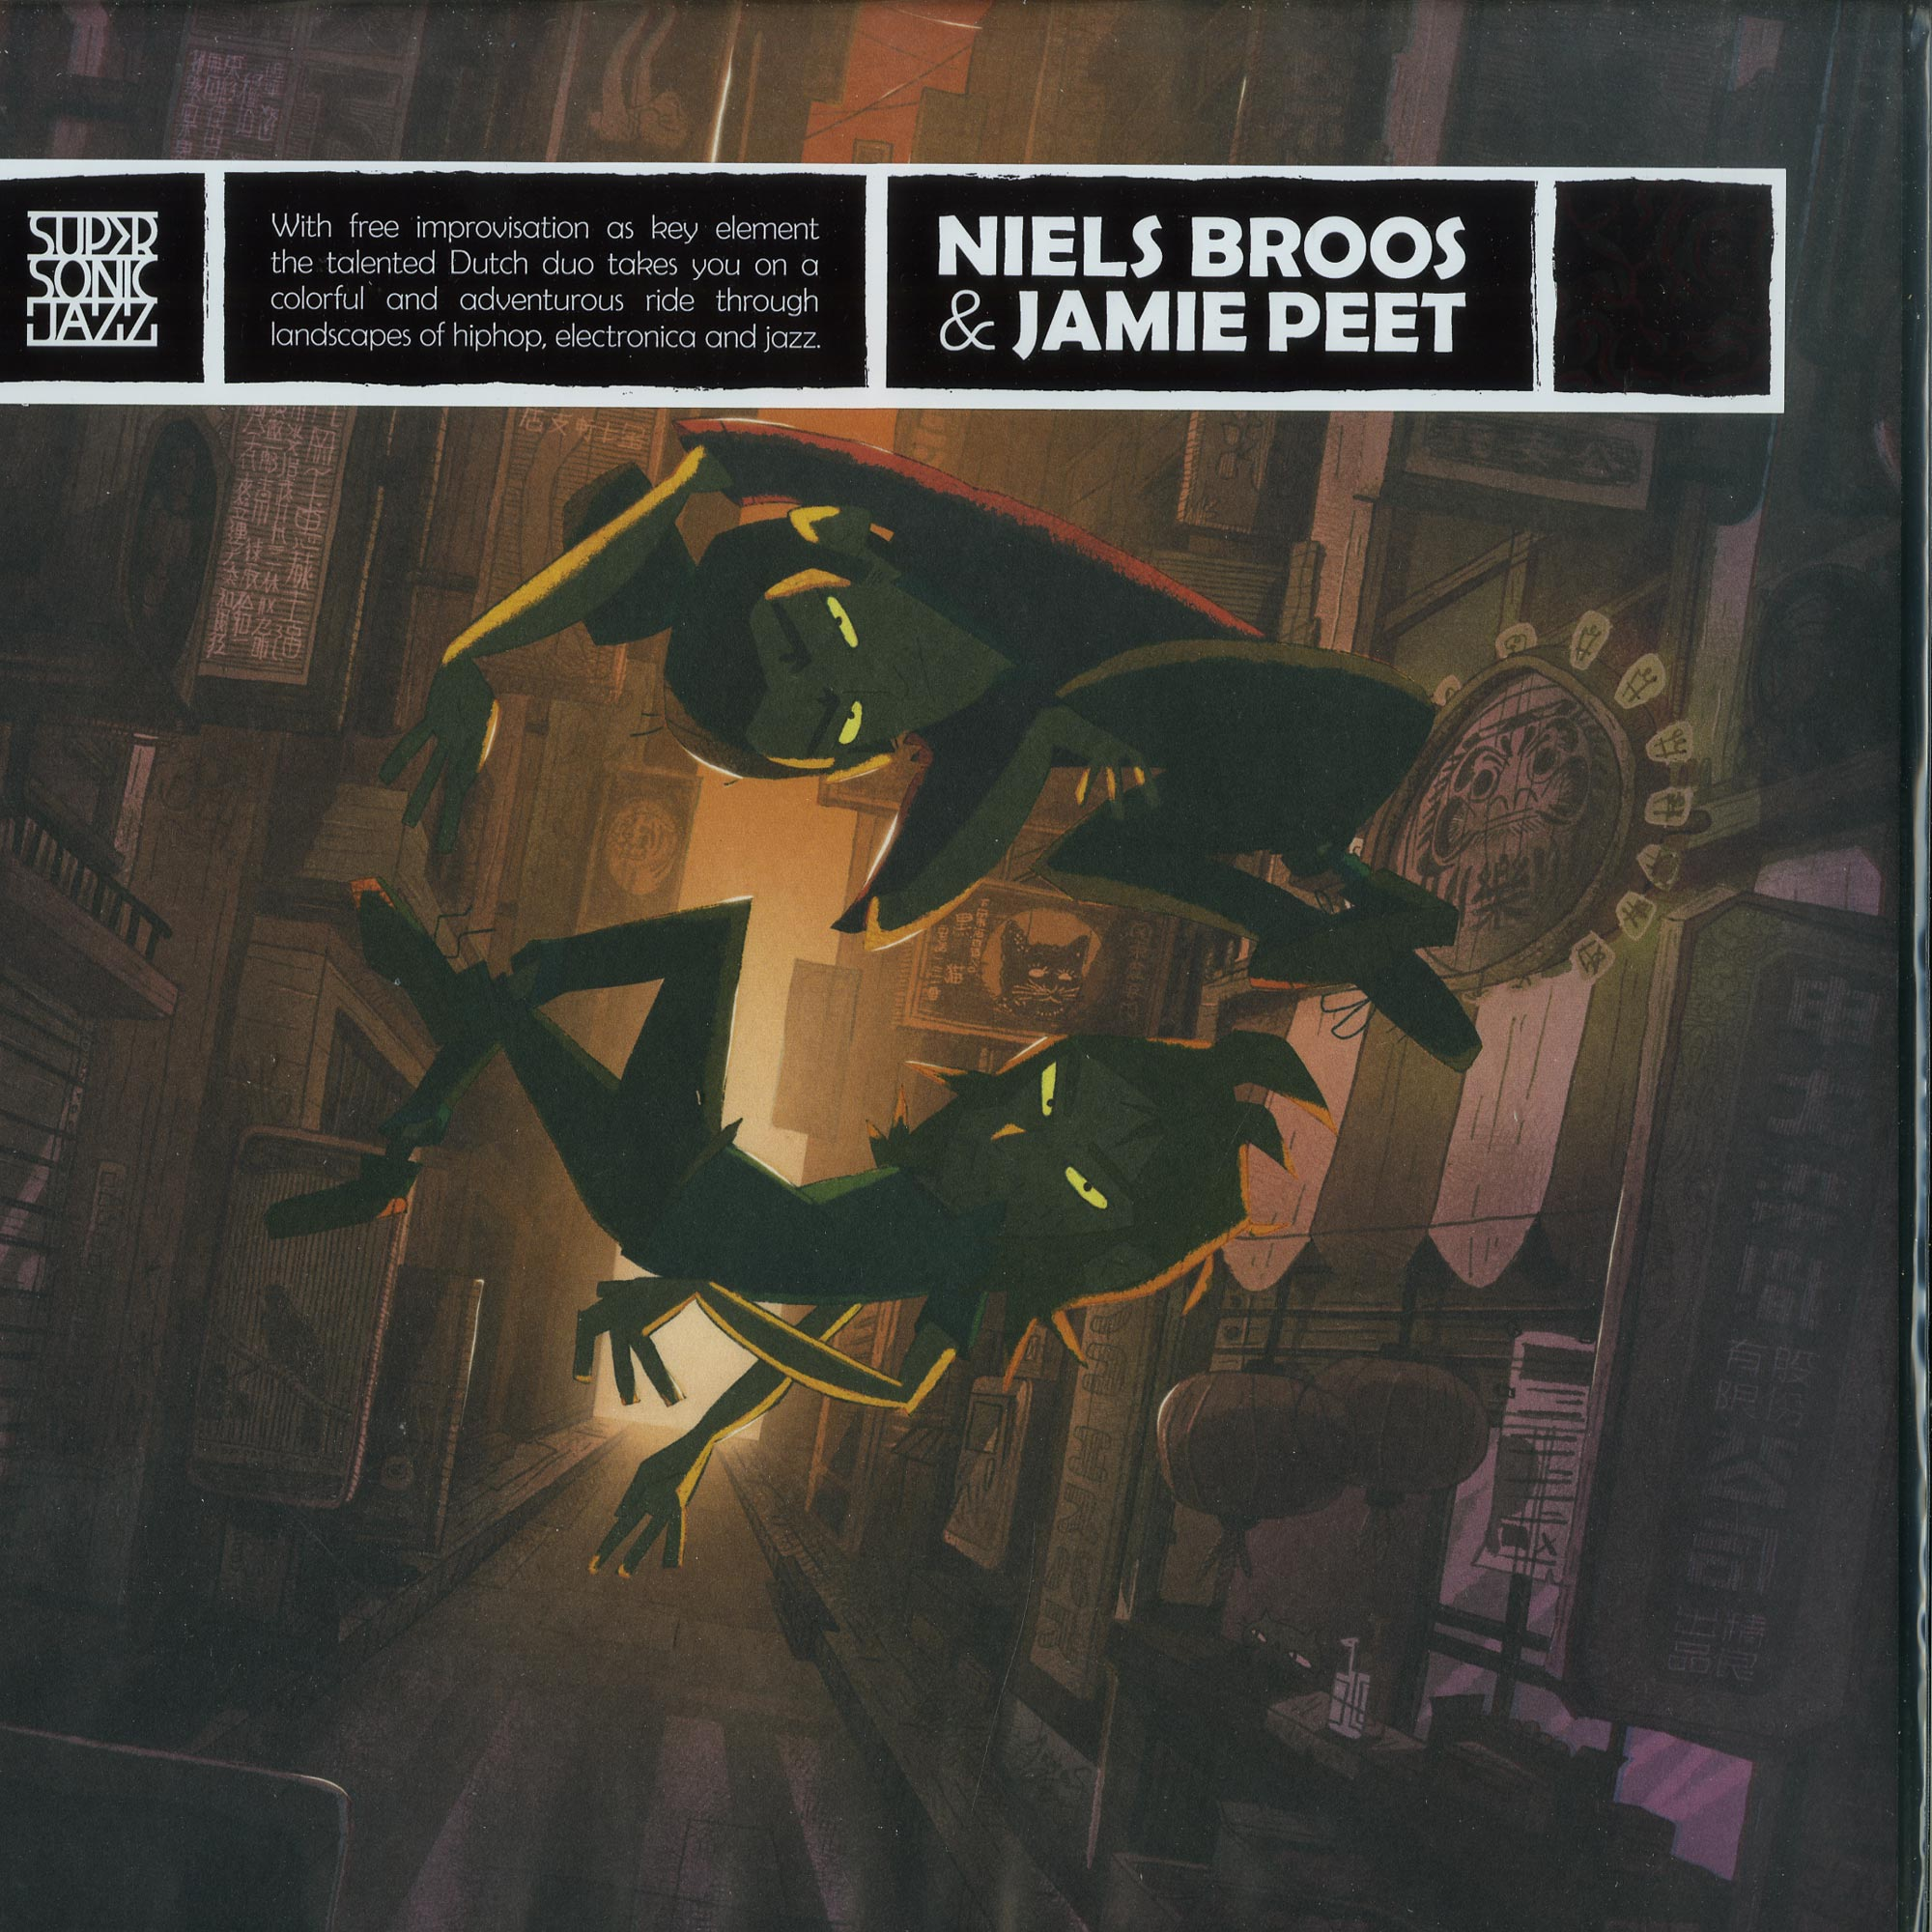 Niels Broos & Jamie Peet - Niels Broos & Jamie Peet